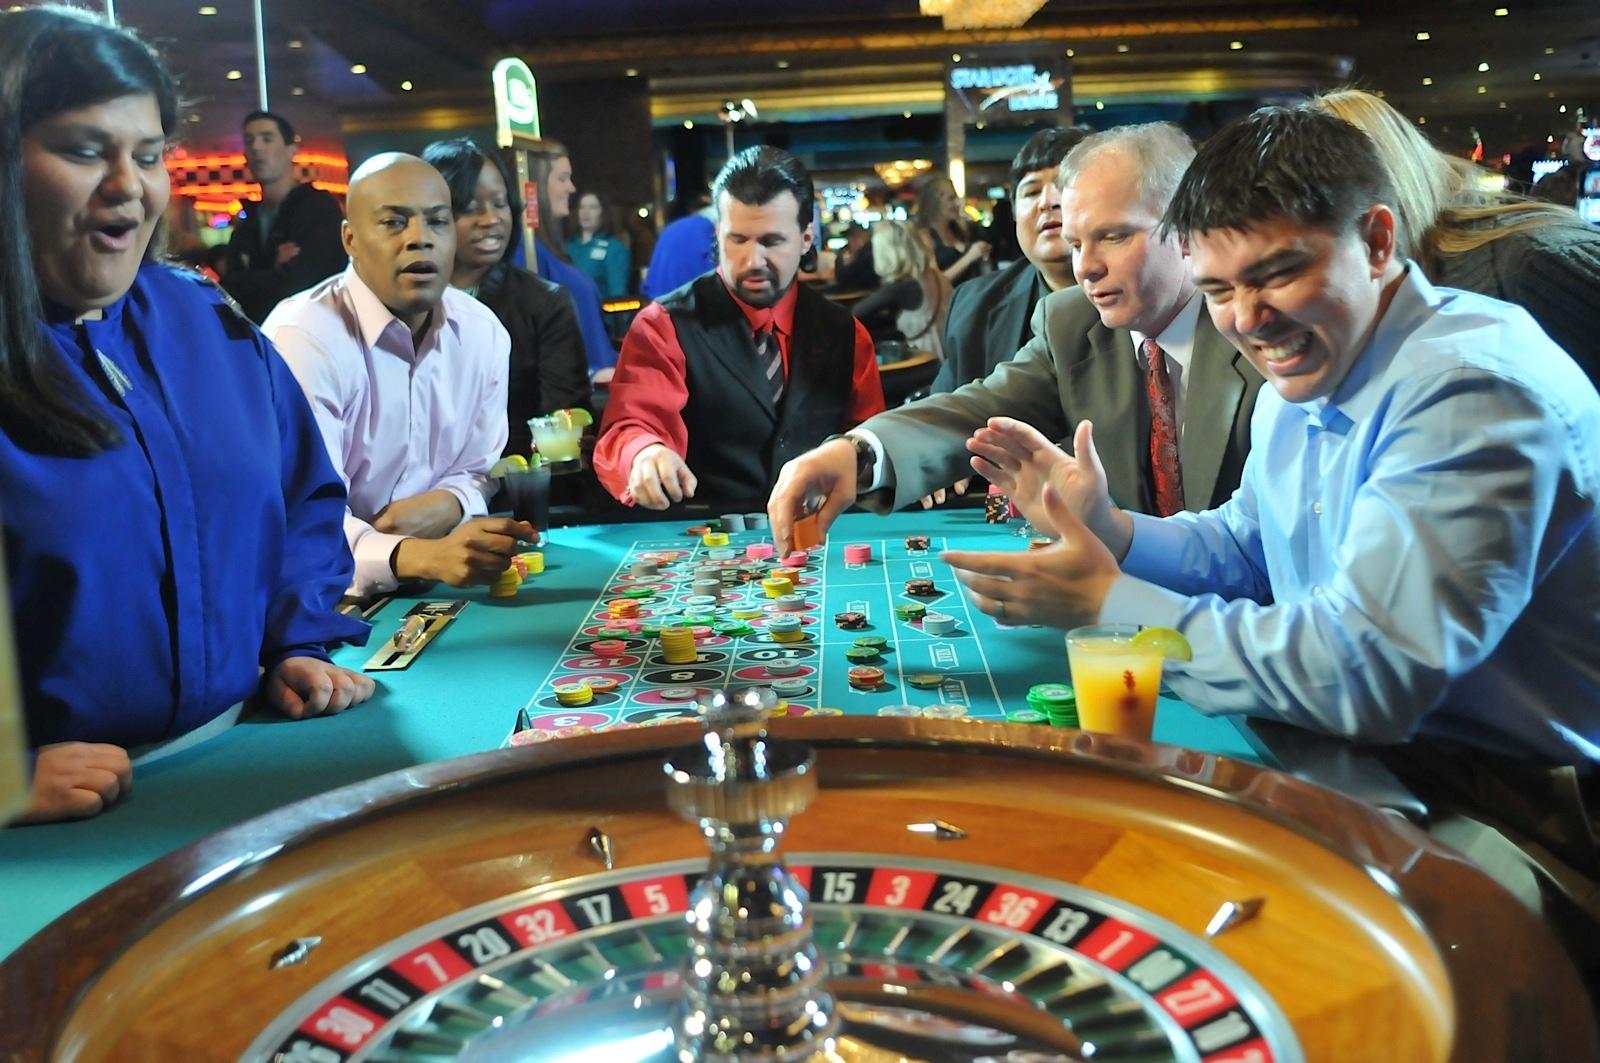 Roulette at Gambling Resorts